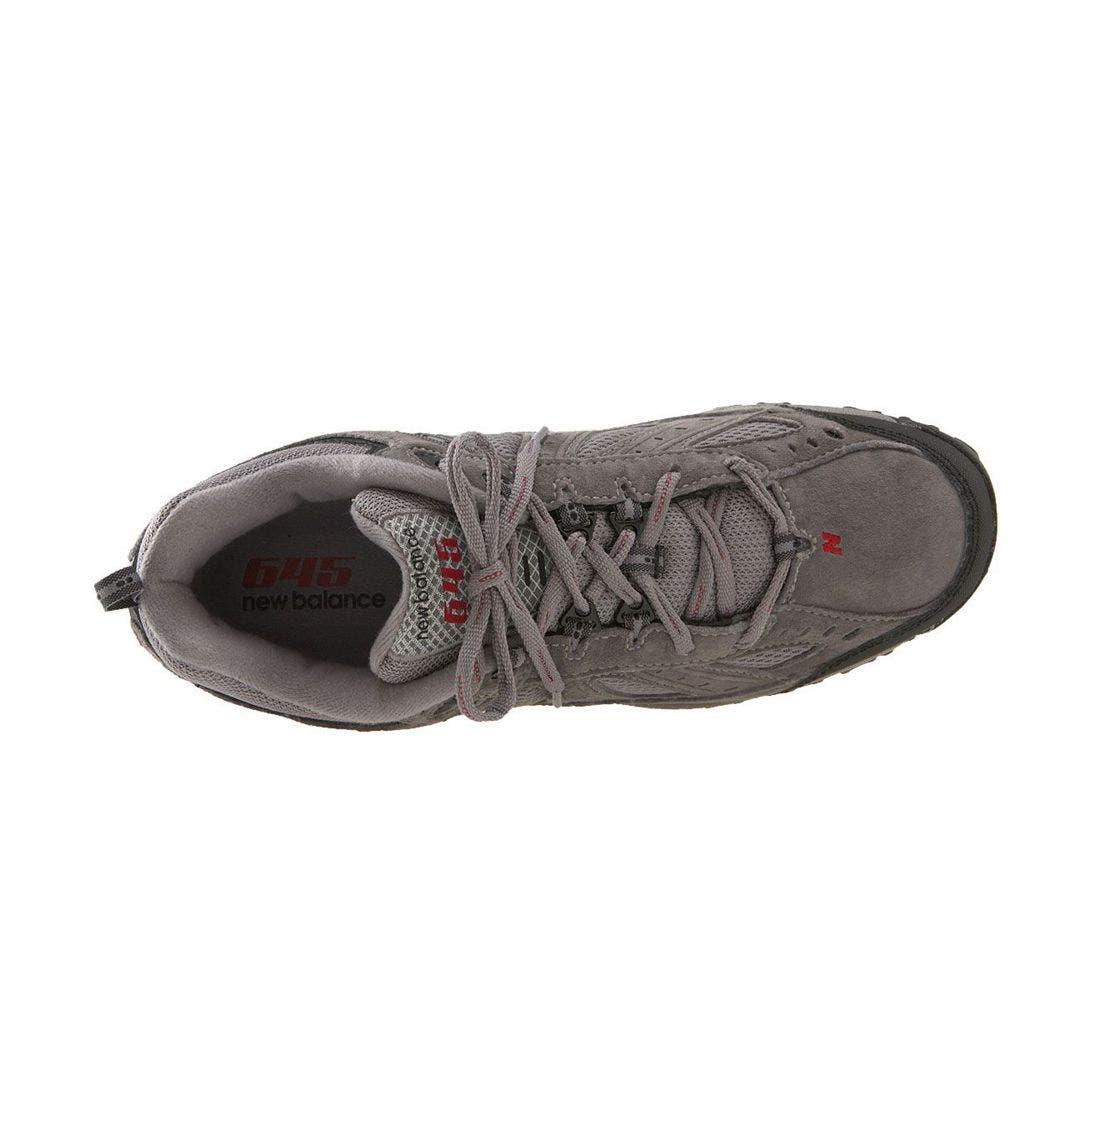 NEW BALANCE,                             'MW645' Hiking Shoe,                             Alternate thumbnail 4, color,                             030